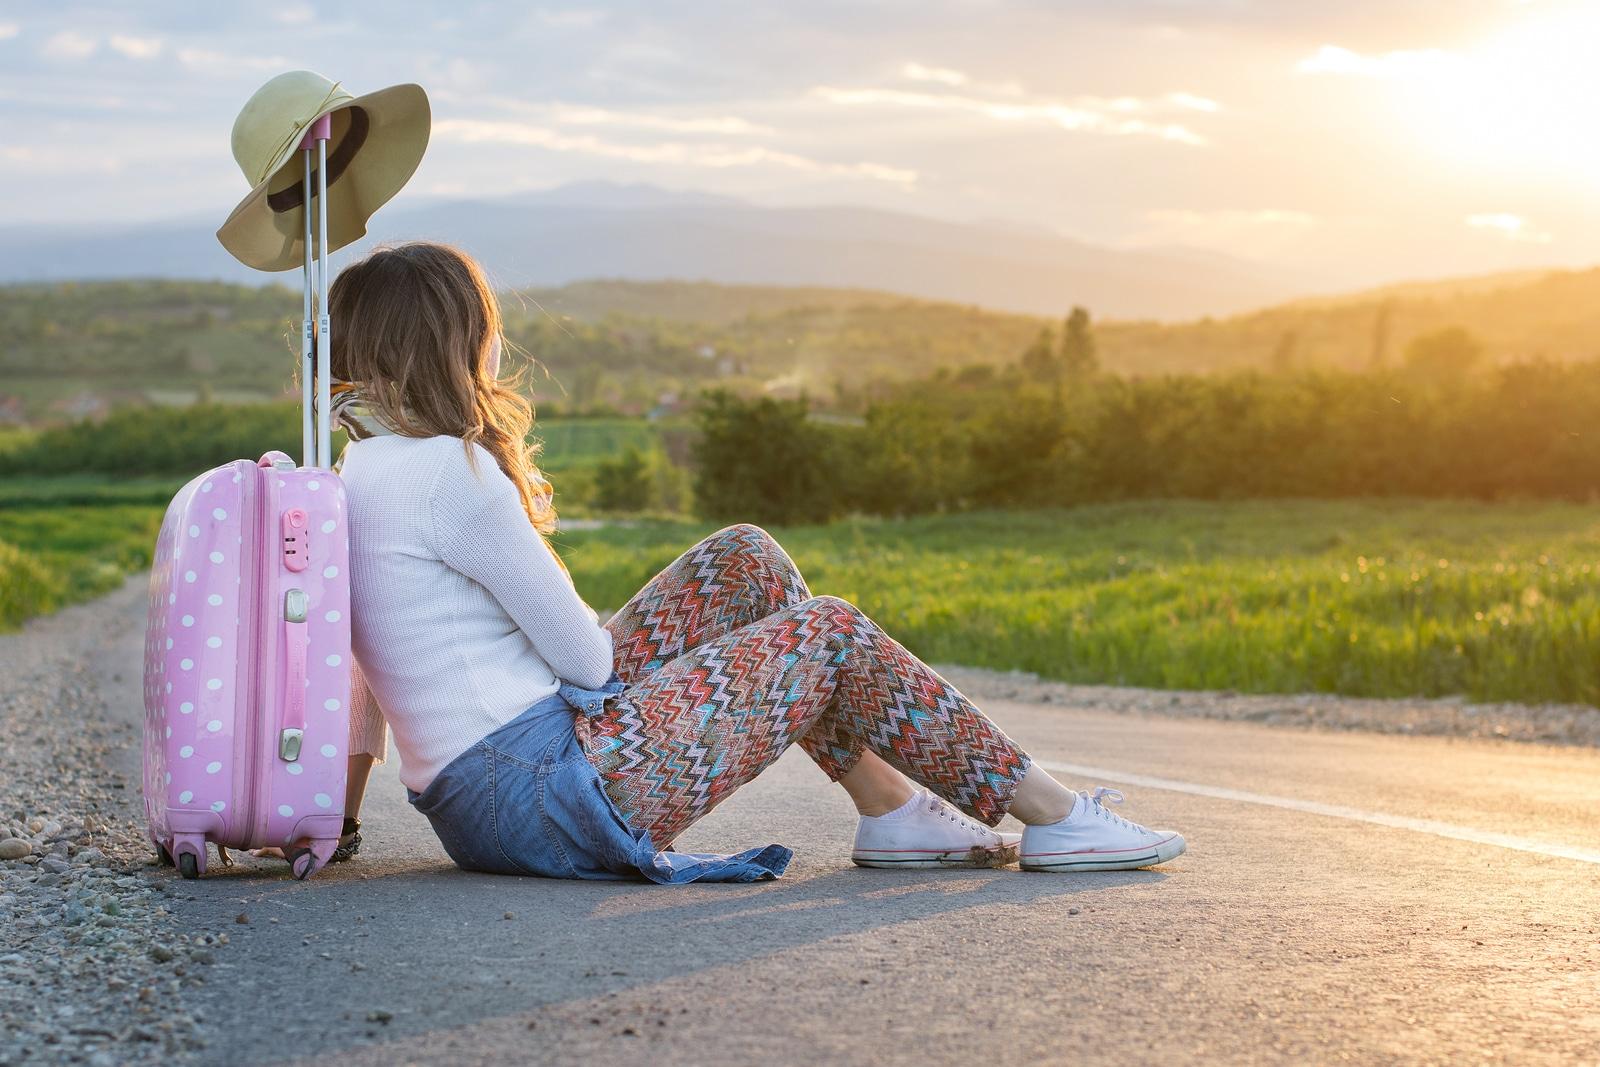 ¿No te da miedo viajar sola? - Historias de una viajera por Claudia Álvarez